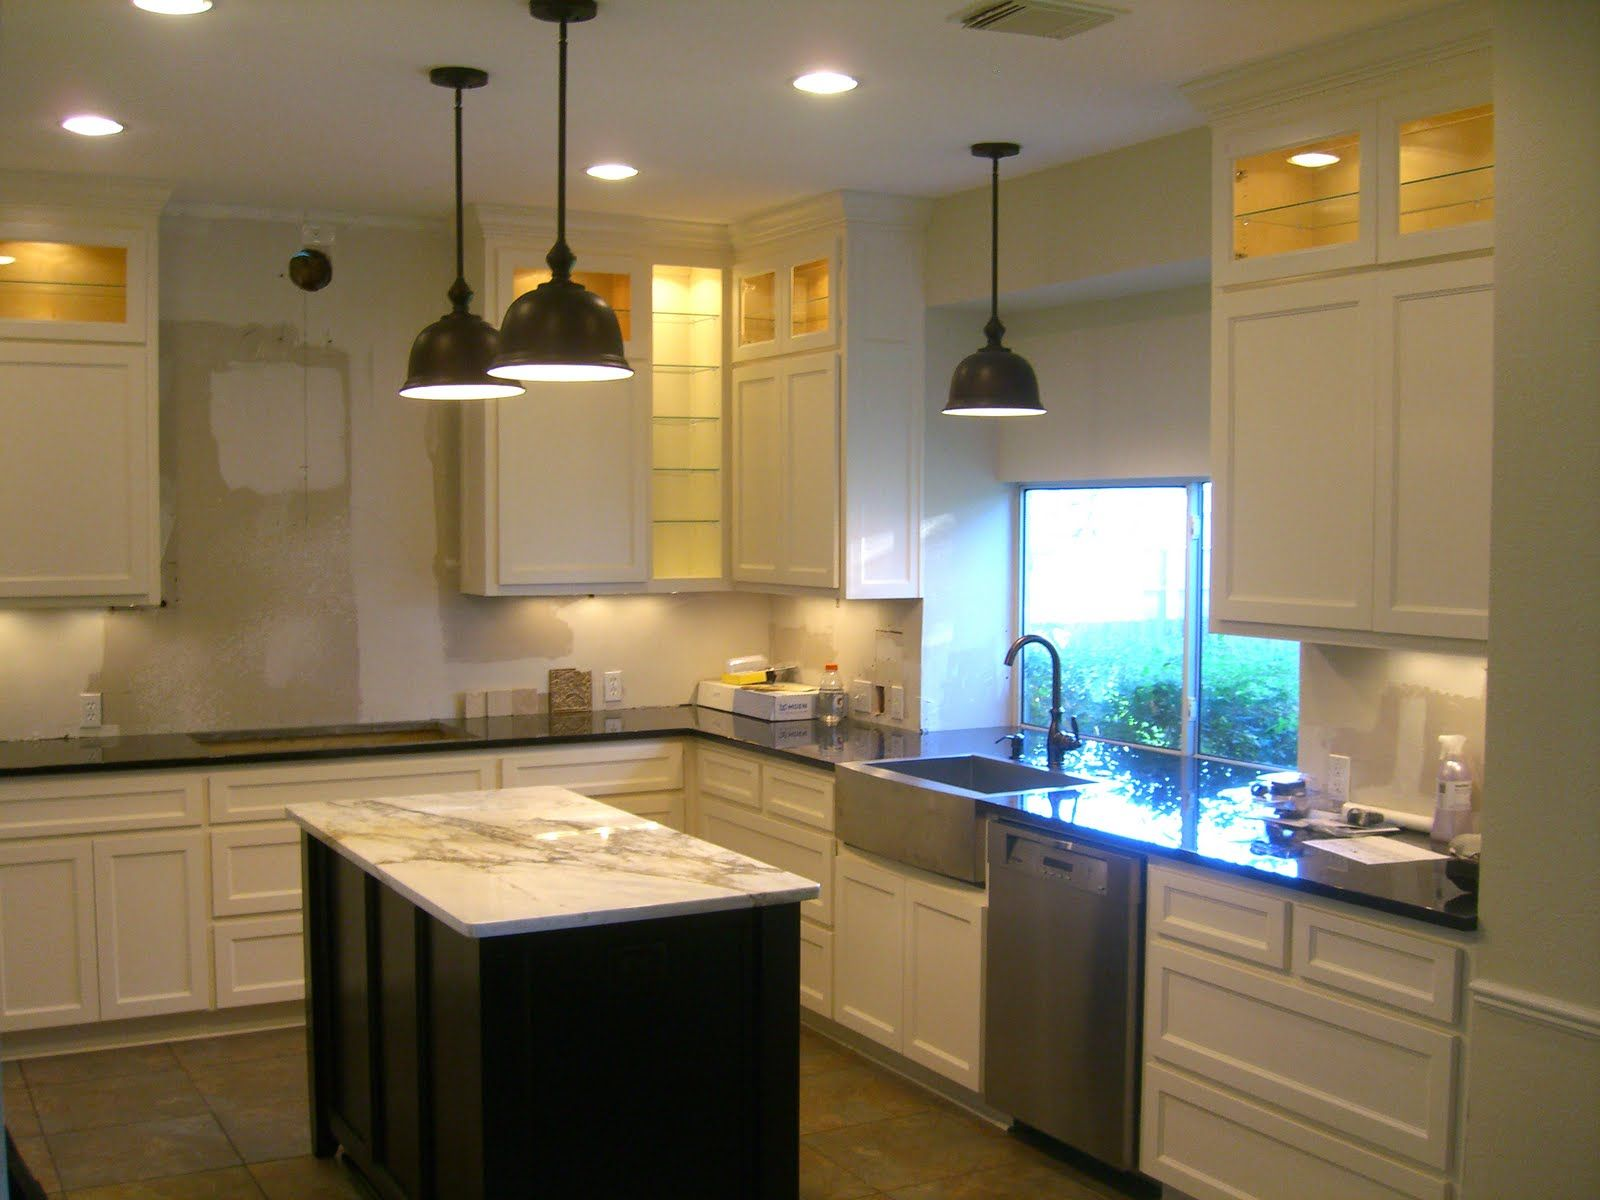 Kitchen Remodel Lights And Faucet Kuche Licht Kuche